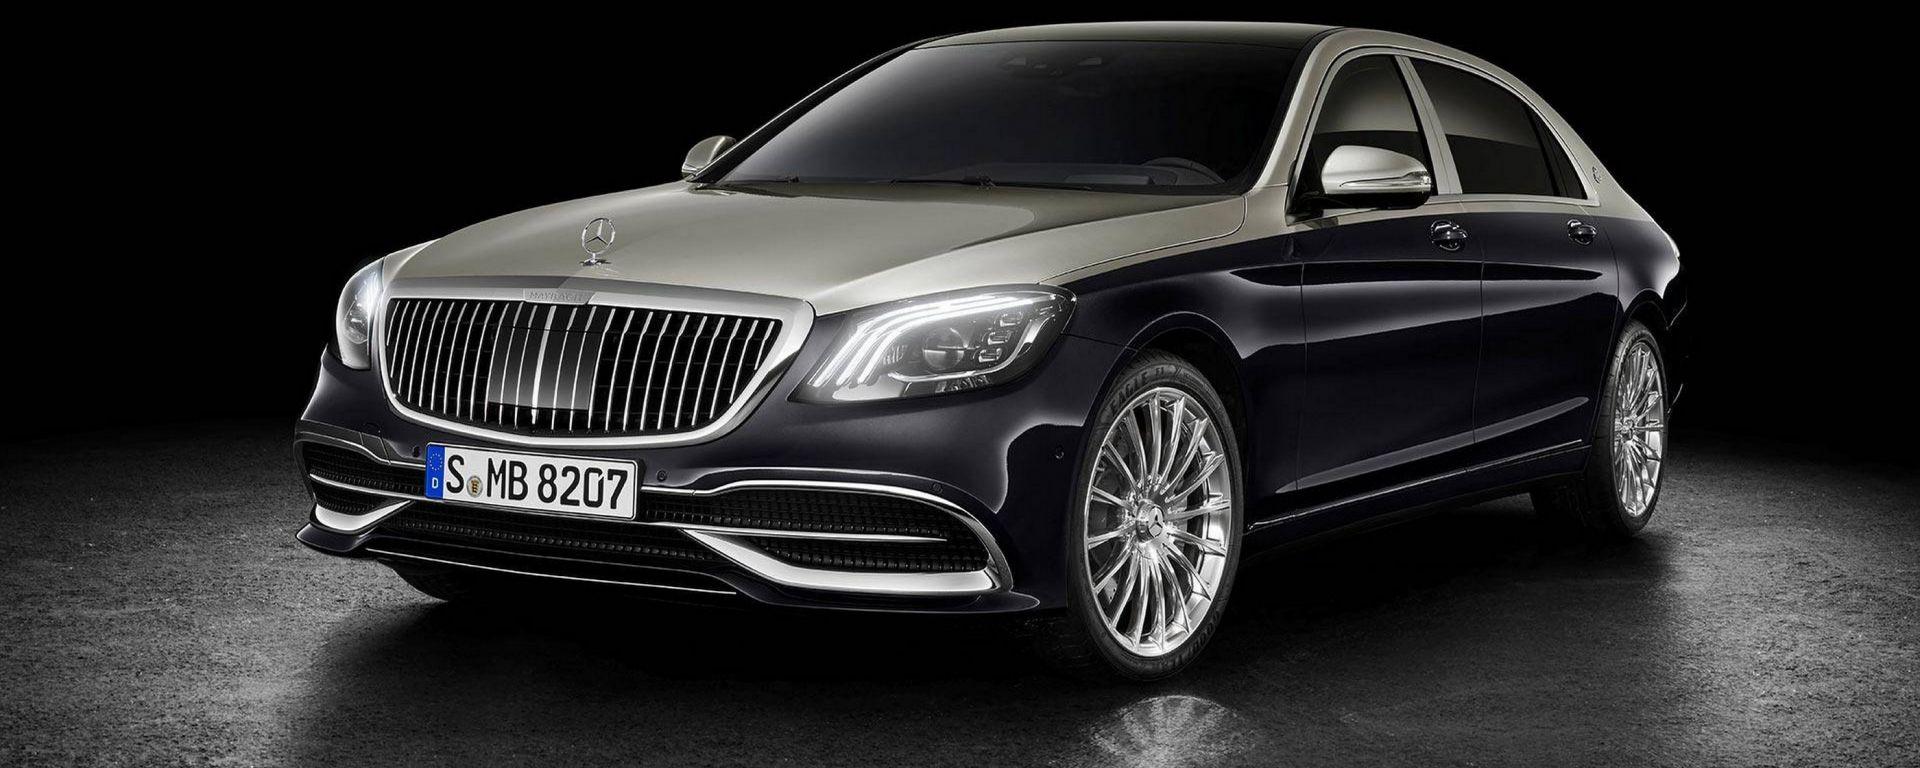 Mercedes Classe S Maybach: il restyling al Salone di Ginevra